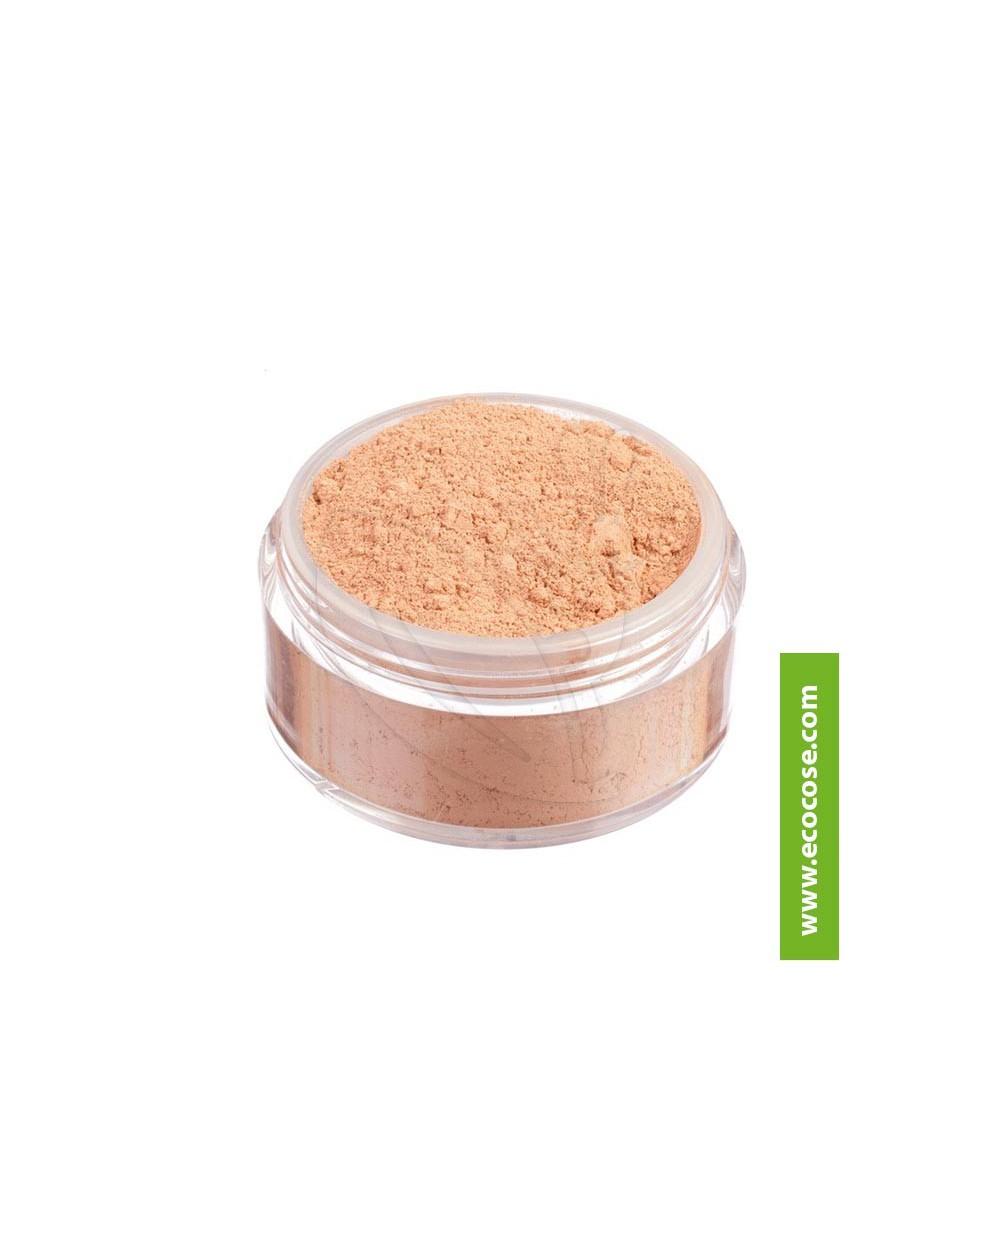 "Neve Cosmetics - Fondotinta Minerale ""Tan Neutral"" High Coverage"